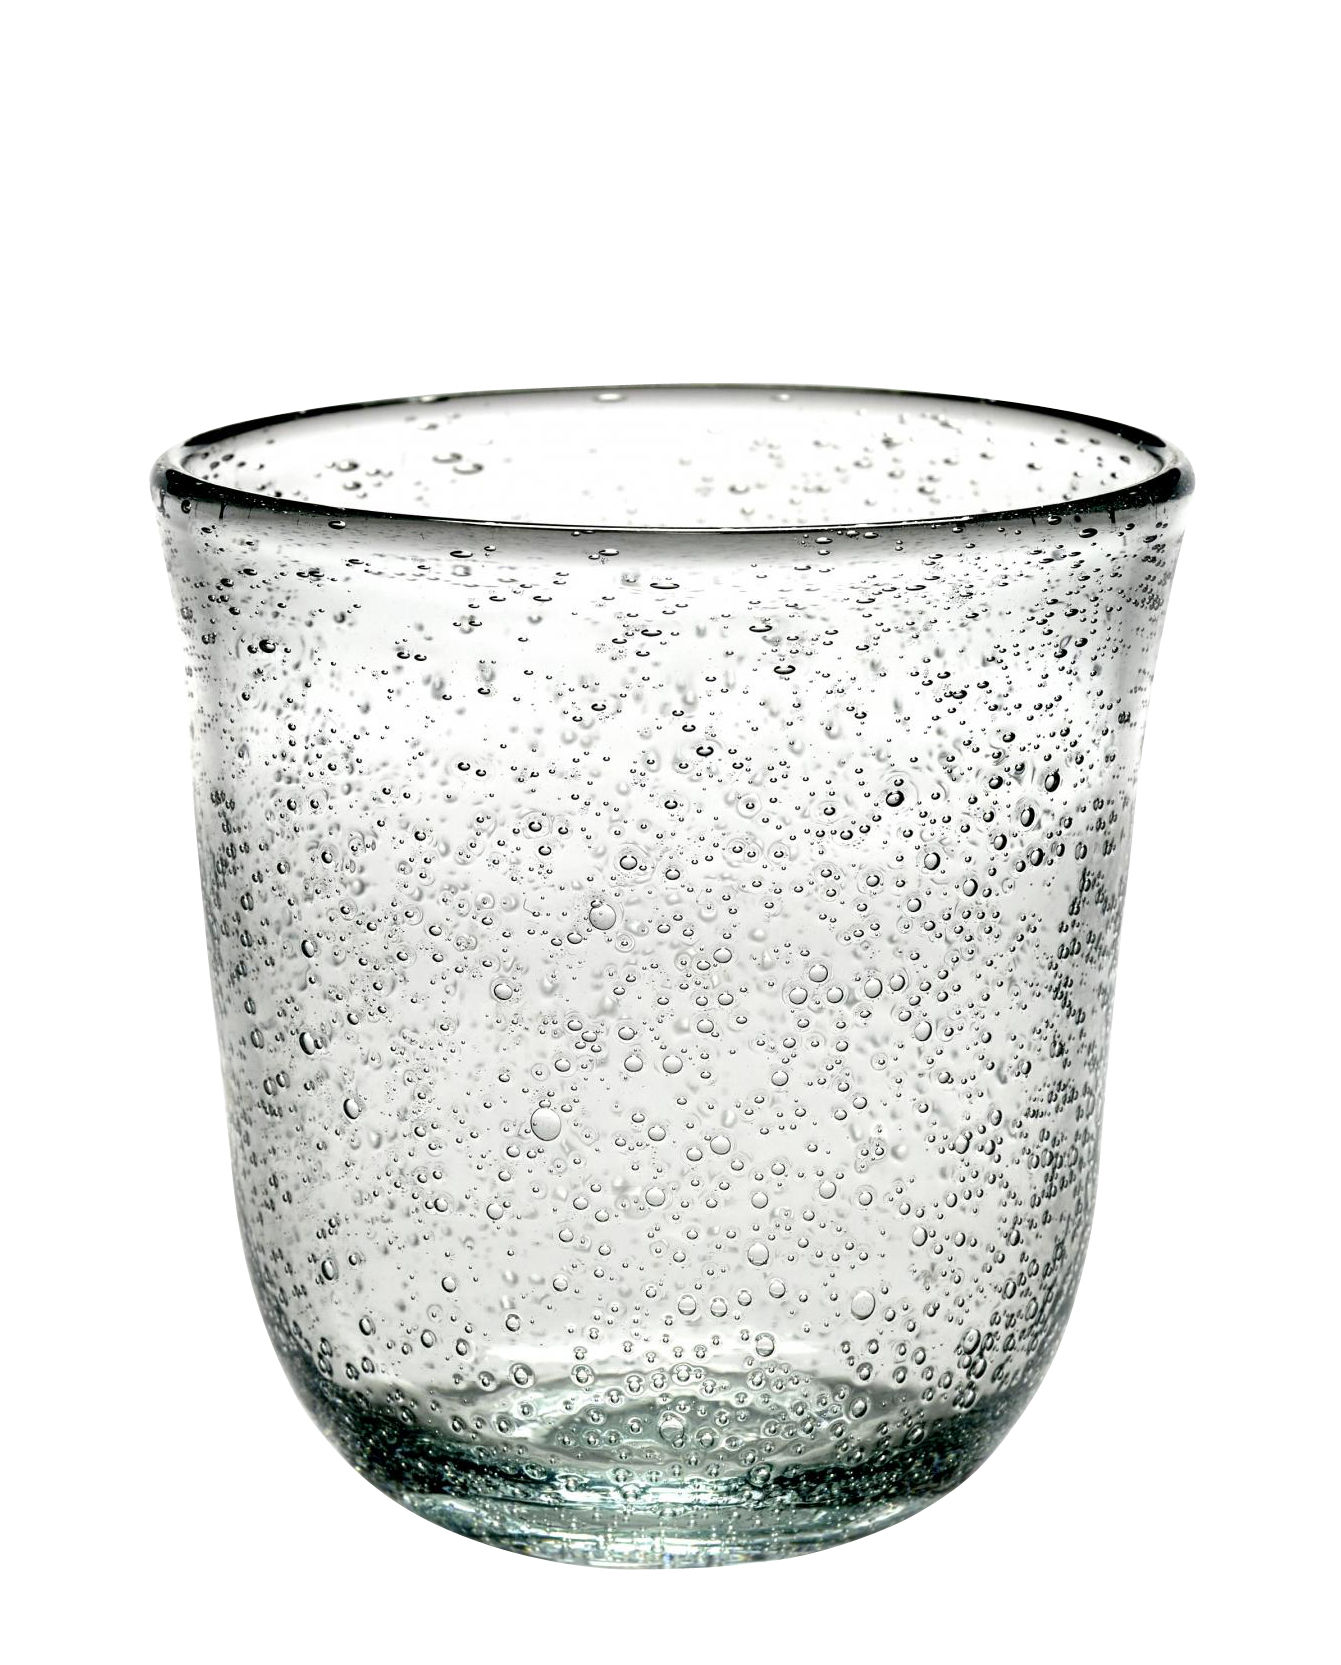 Arts de la table - Verres  - Verre Pure / Fait main - Serax - Transparent - Verre bullé